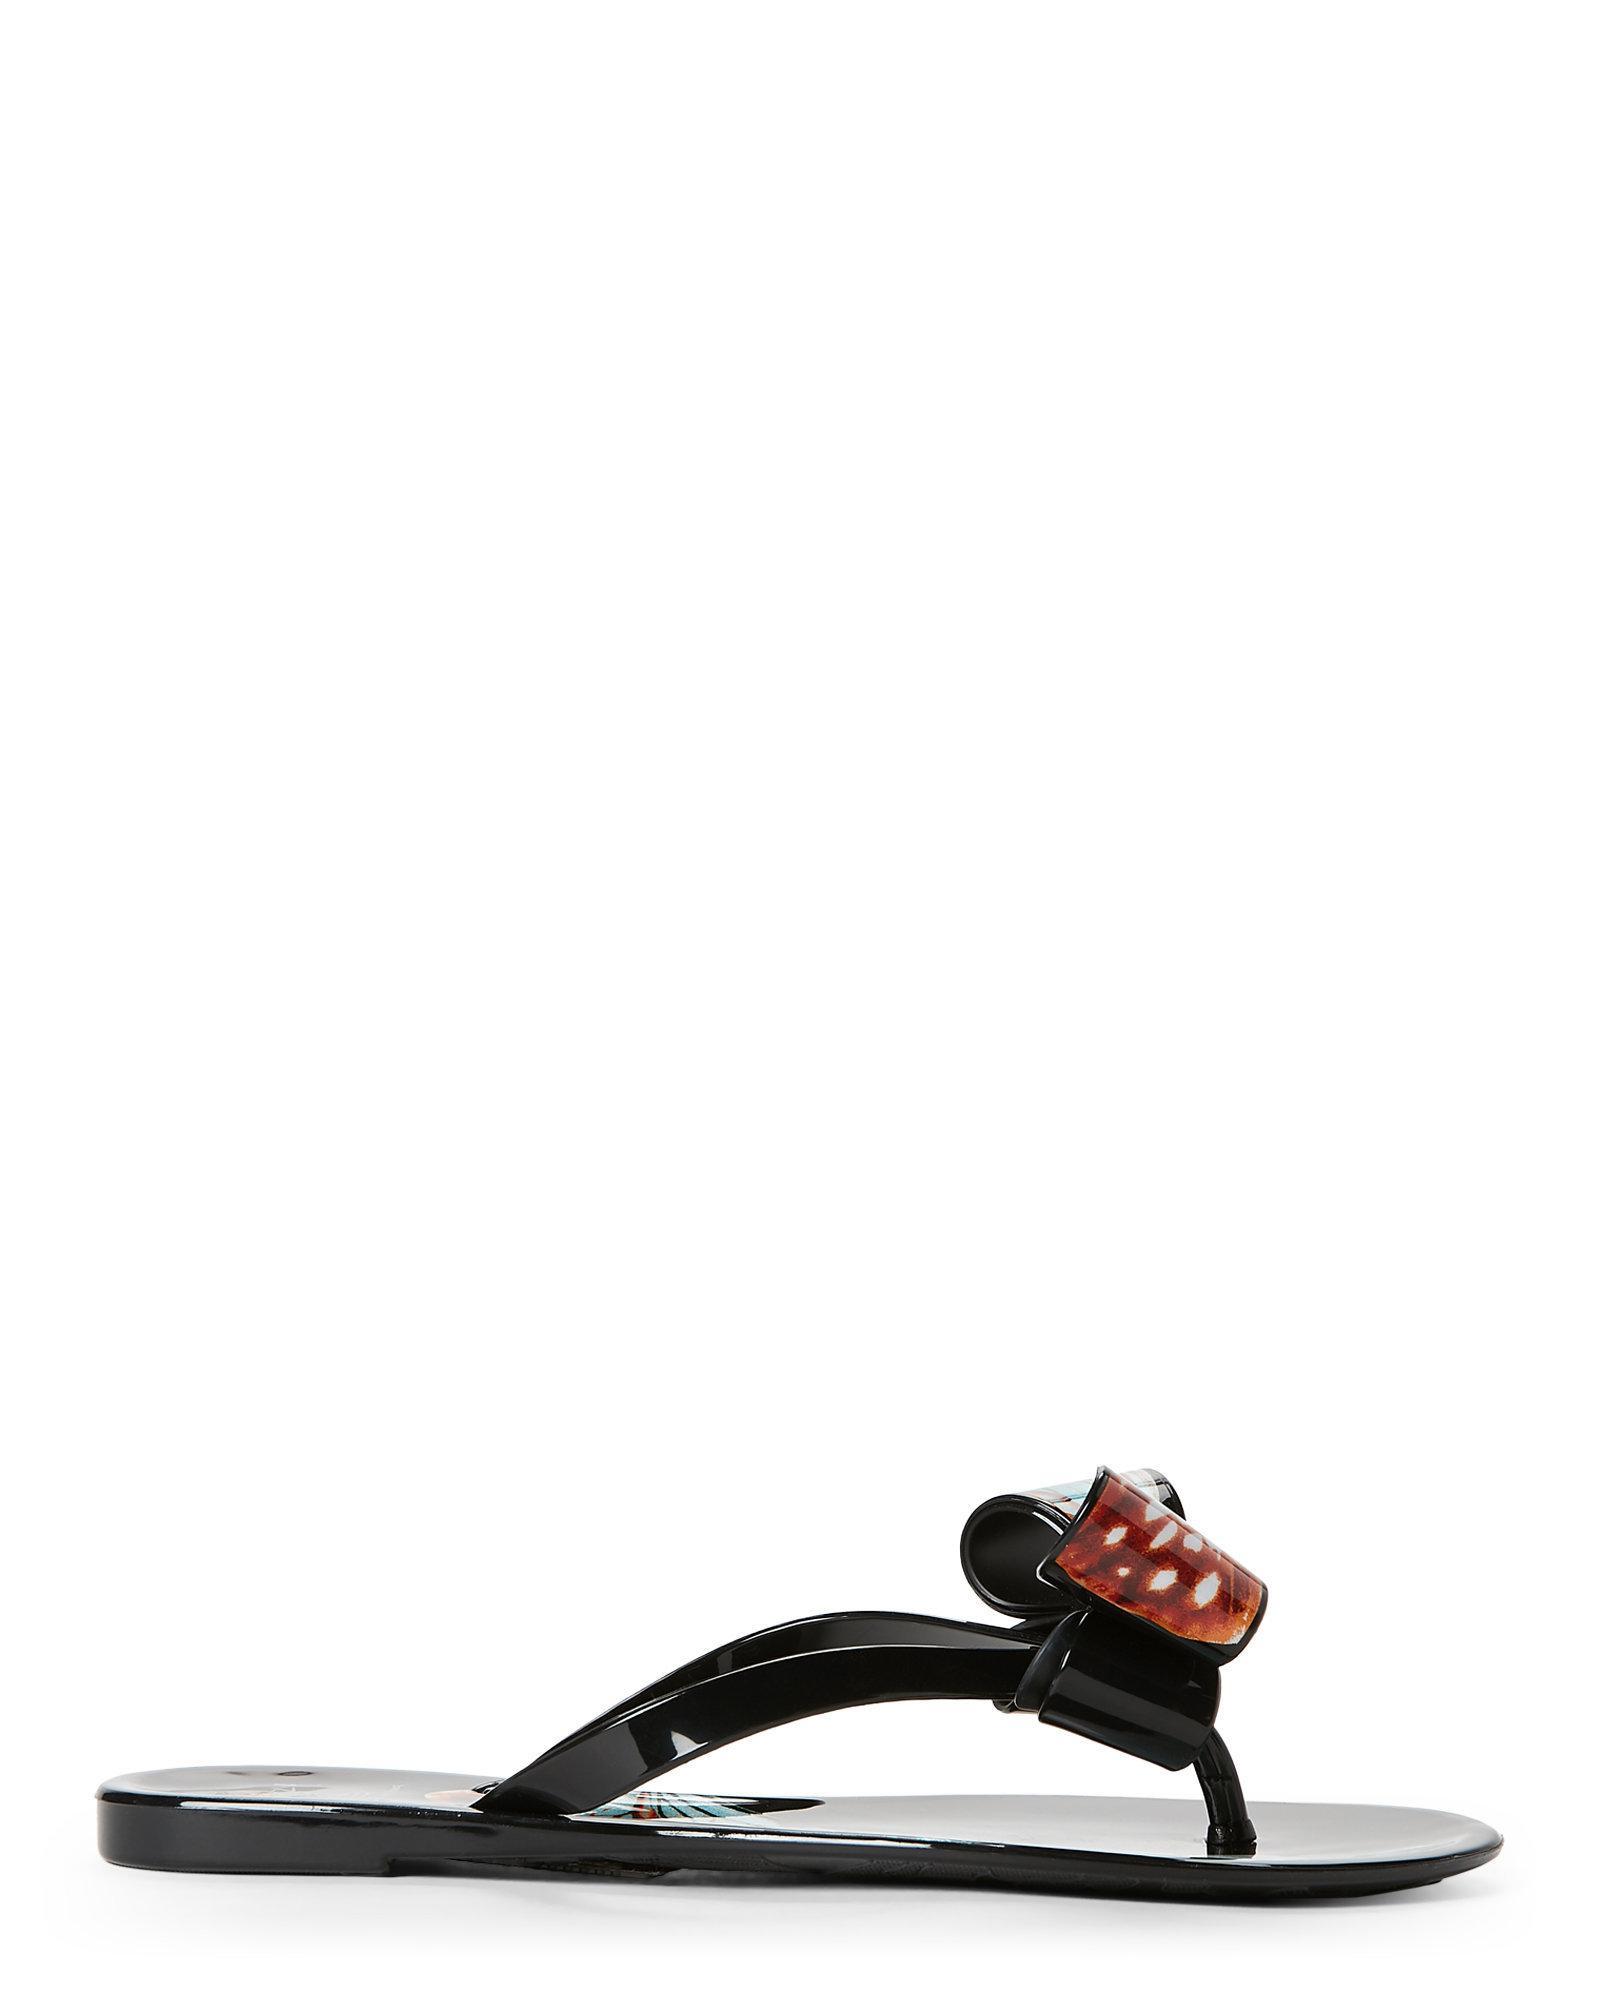 863efc8ce090 Lyst dizzy studded jelly flip flops in black jpg 1600x2000 Jelly studded dizzy  shoes flip flops